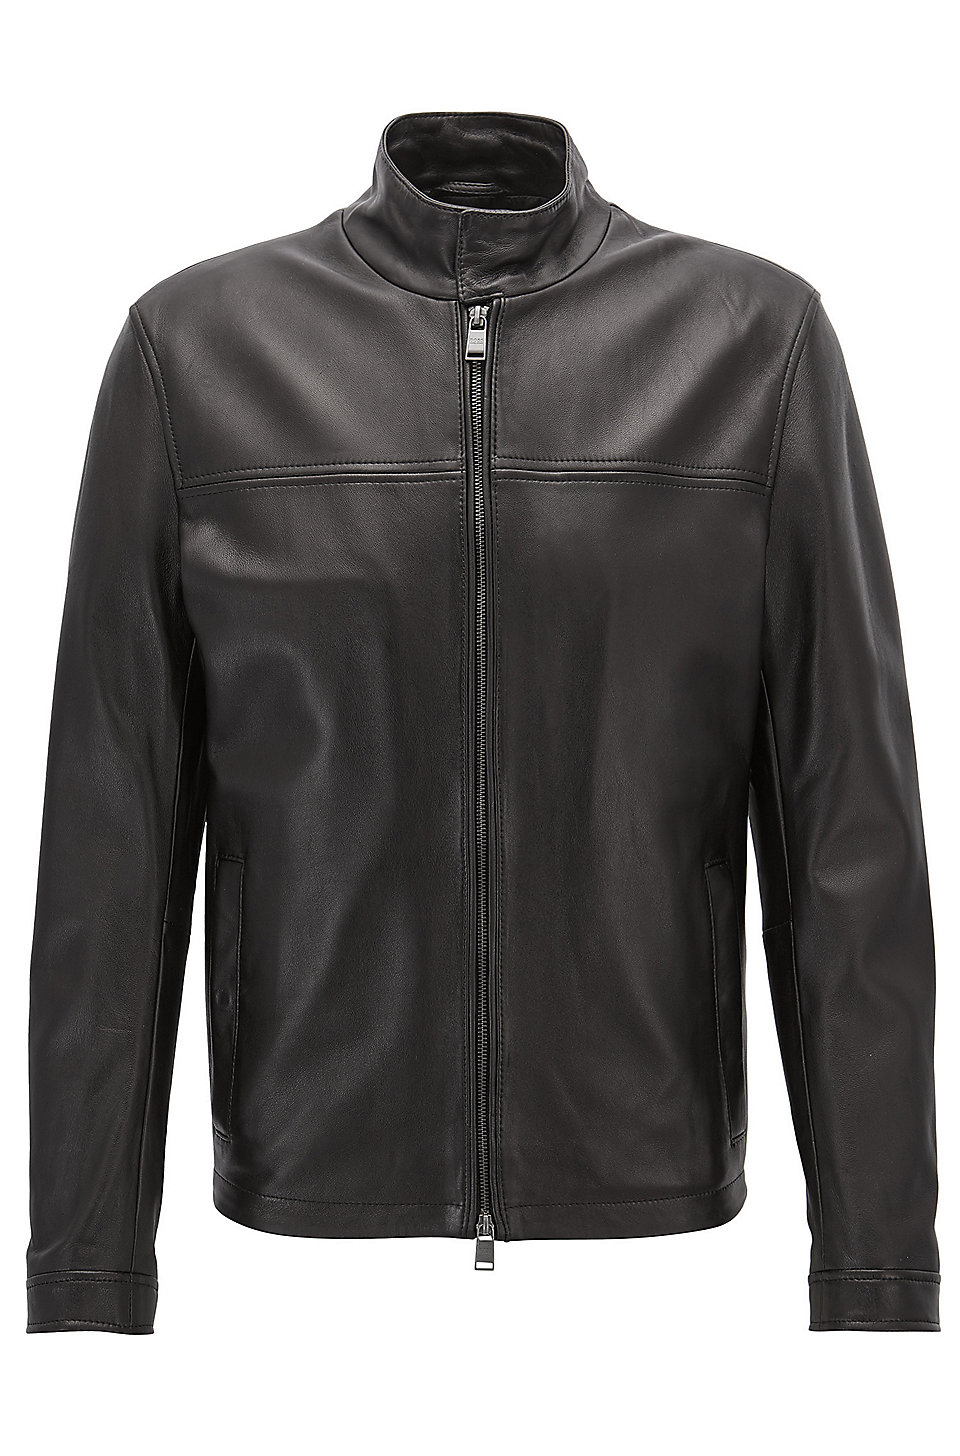 Smooth Mens Color Block Leather Jacket zOQ5p7qvPq